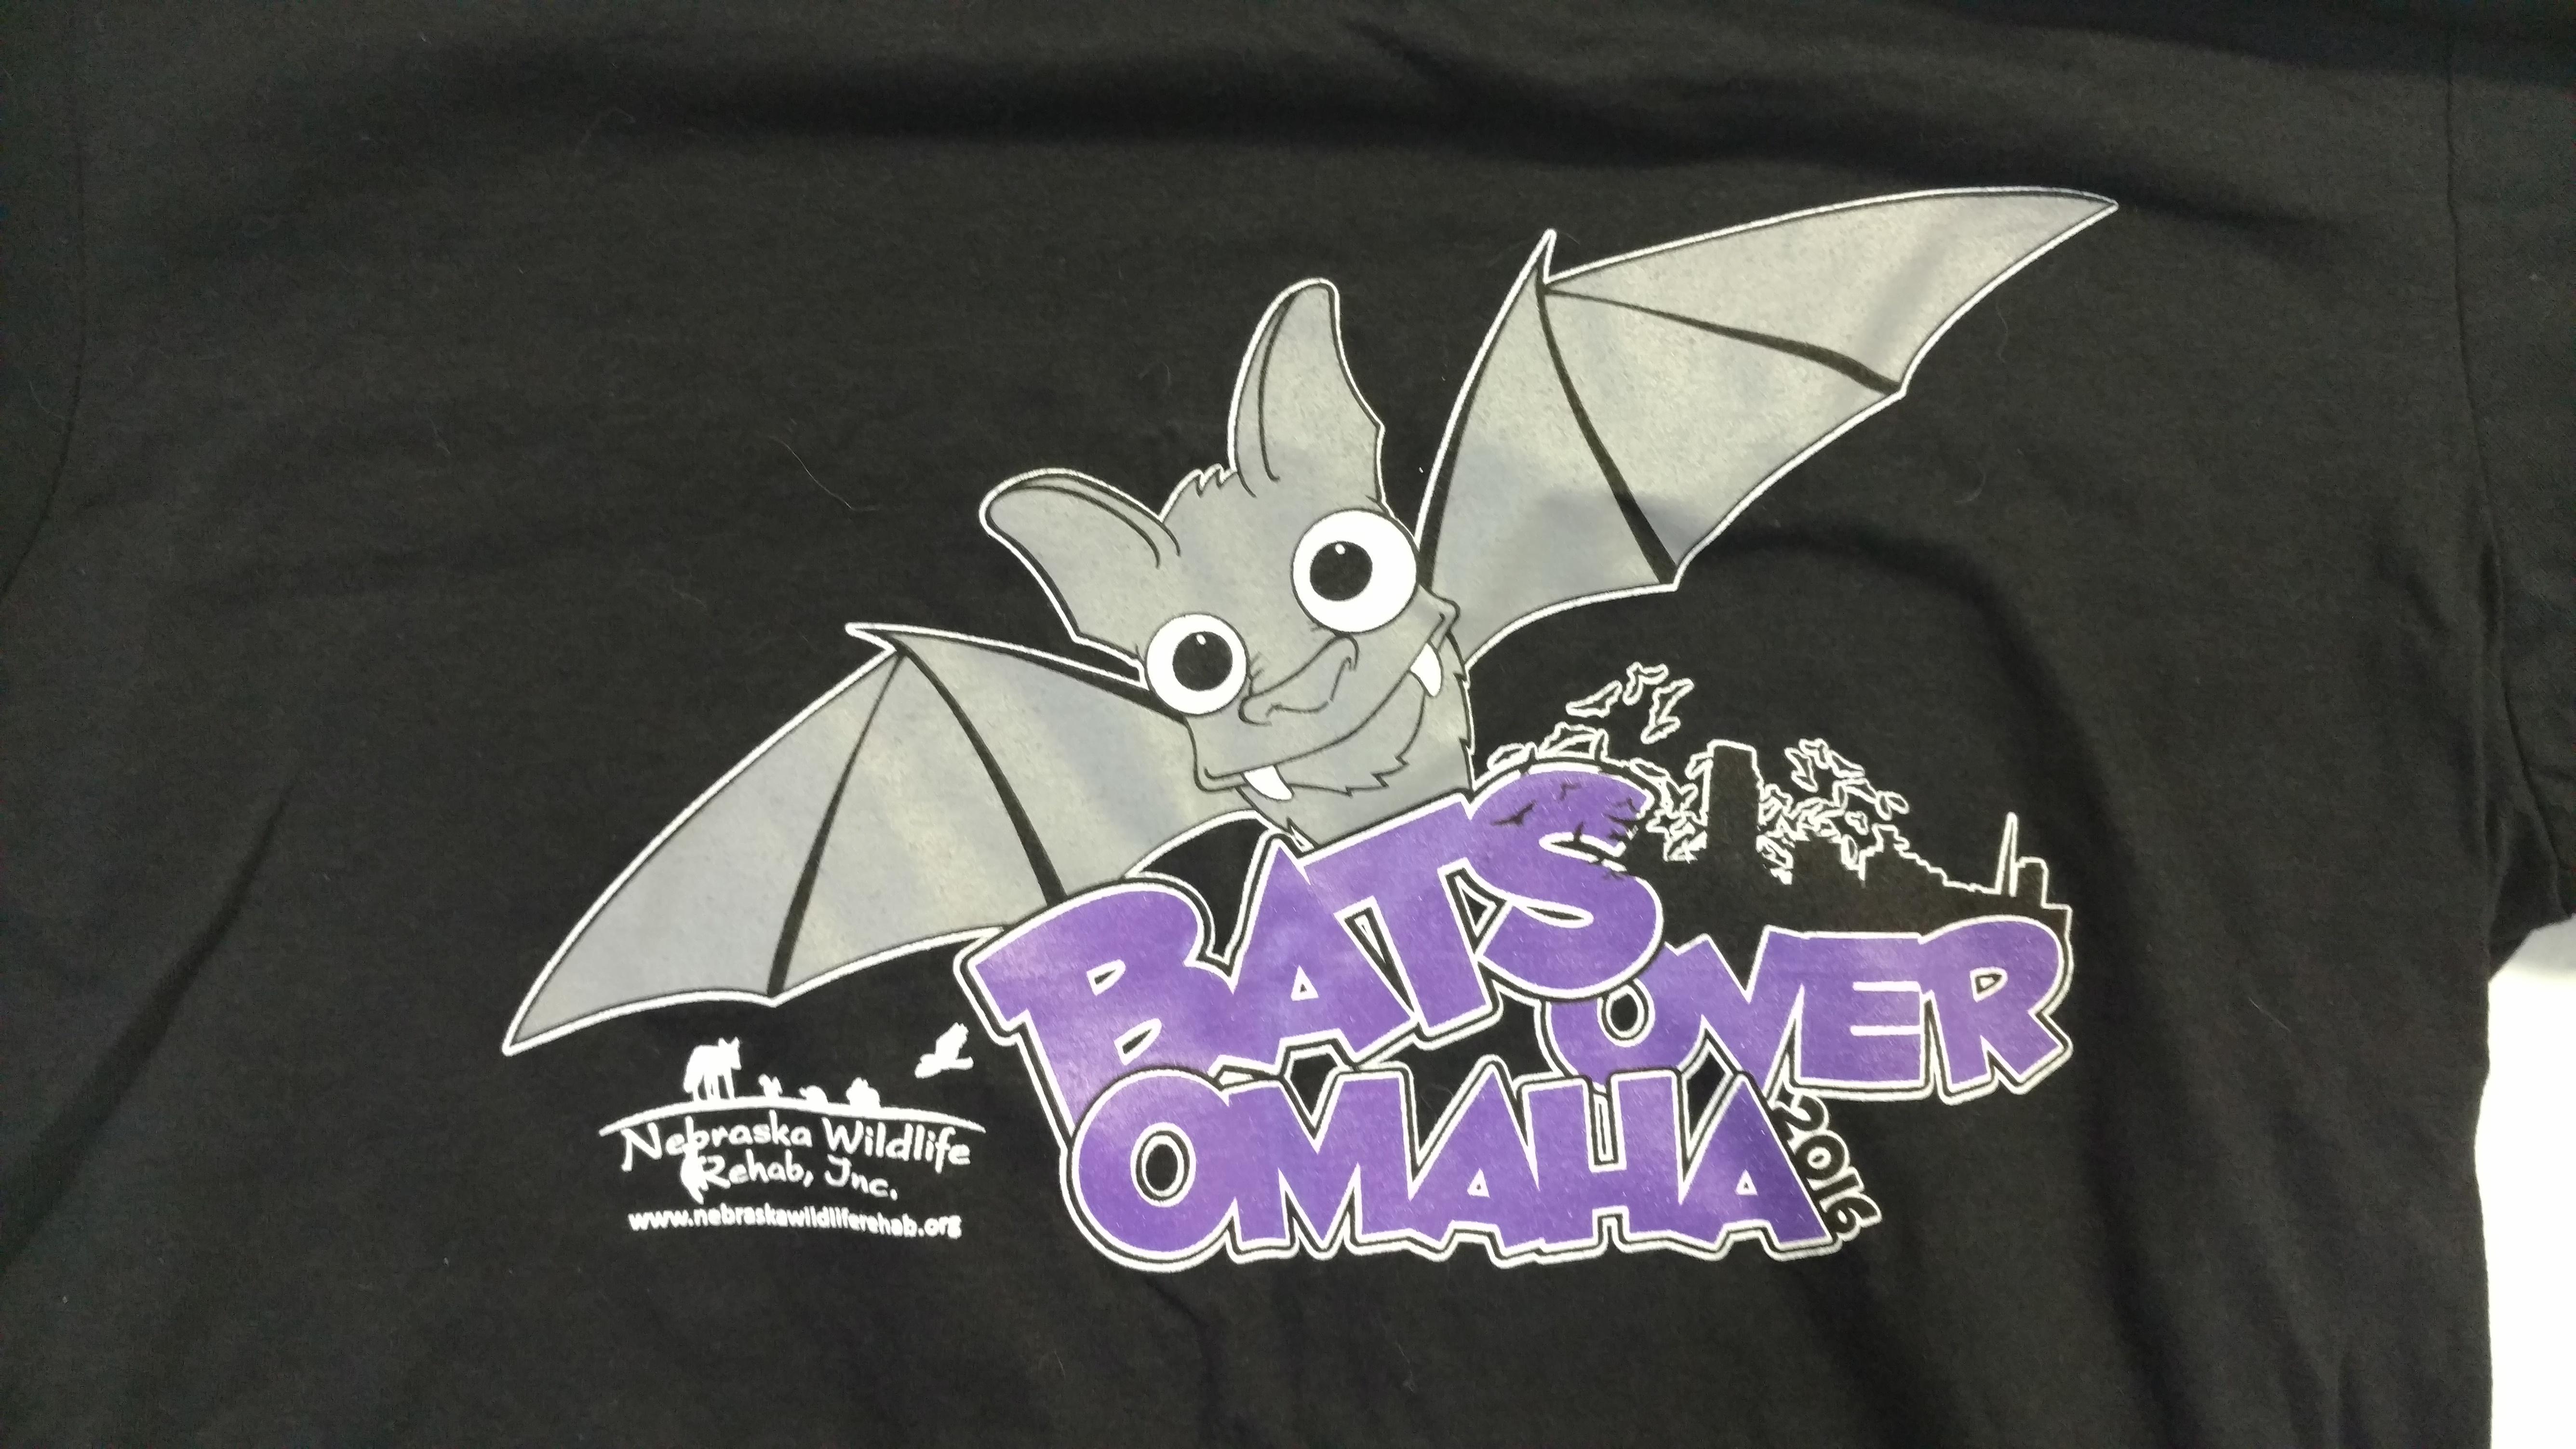 Bats Over Omaha Bat Release T-Shirt - 2016: Adult Large, Black